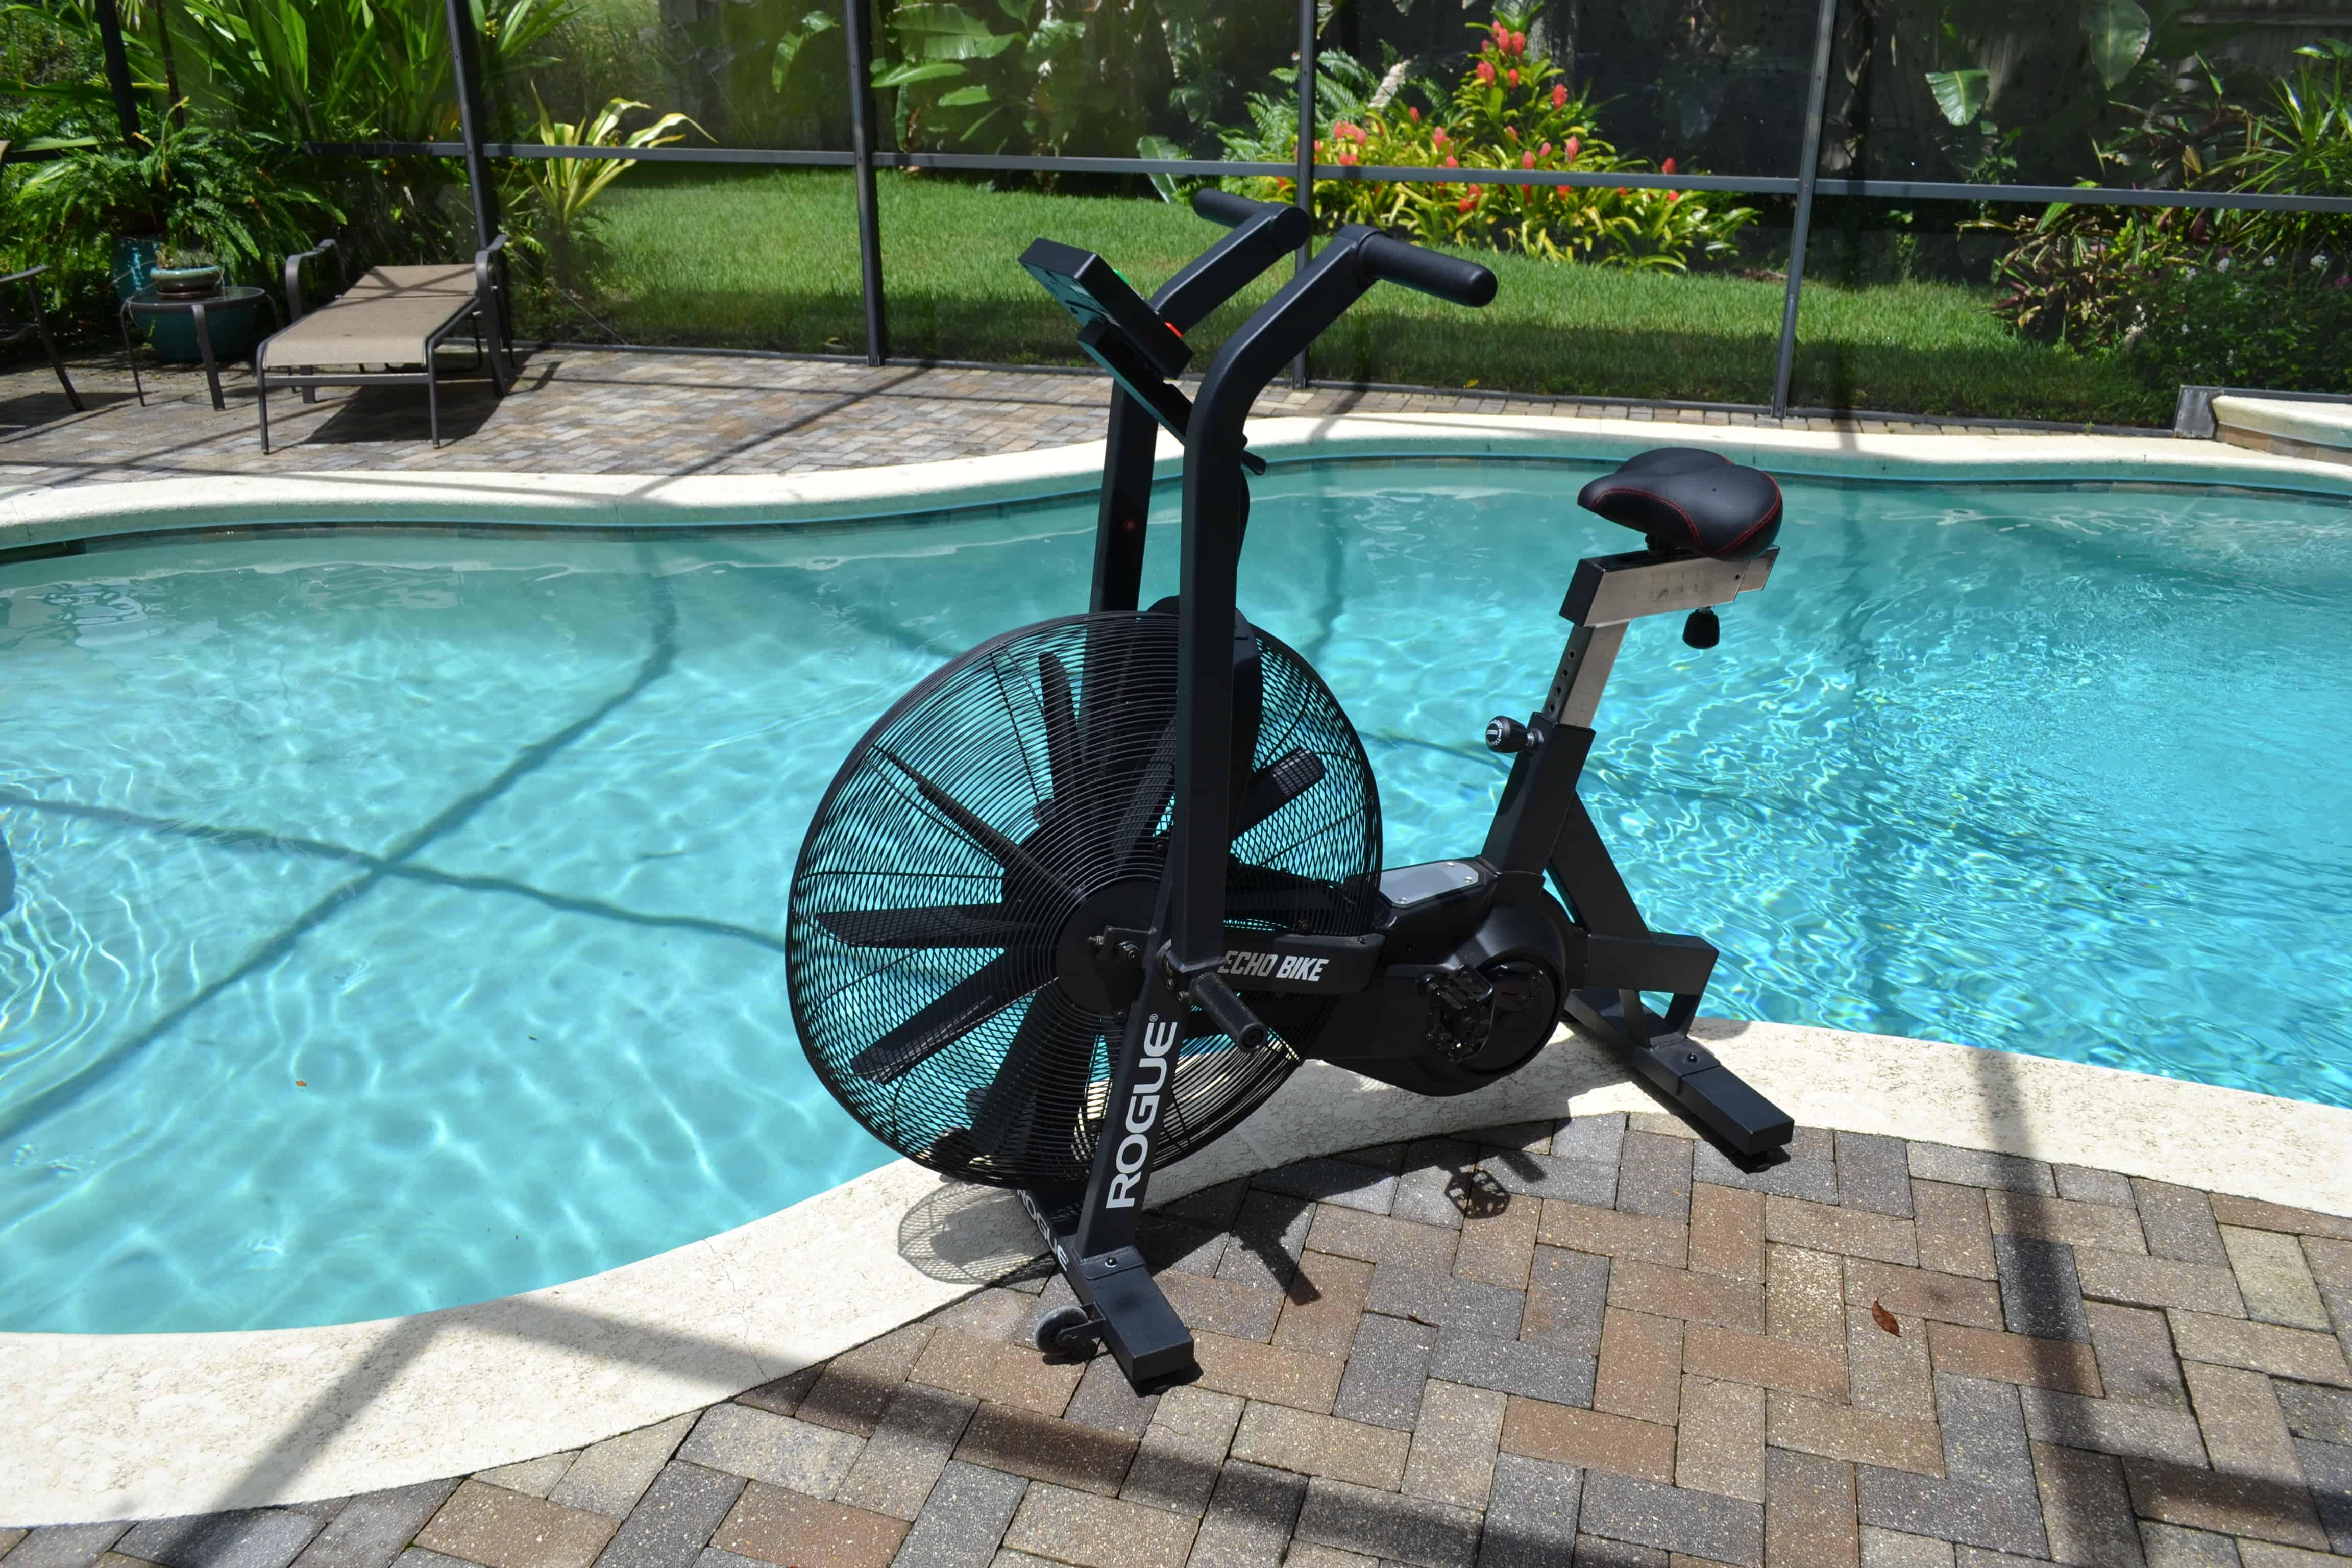 Rogue Echo Bike by the pool